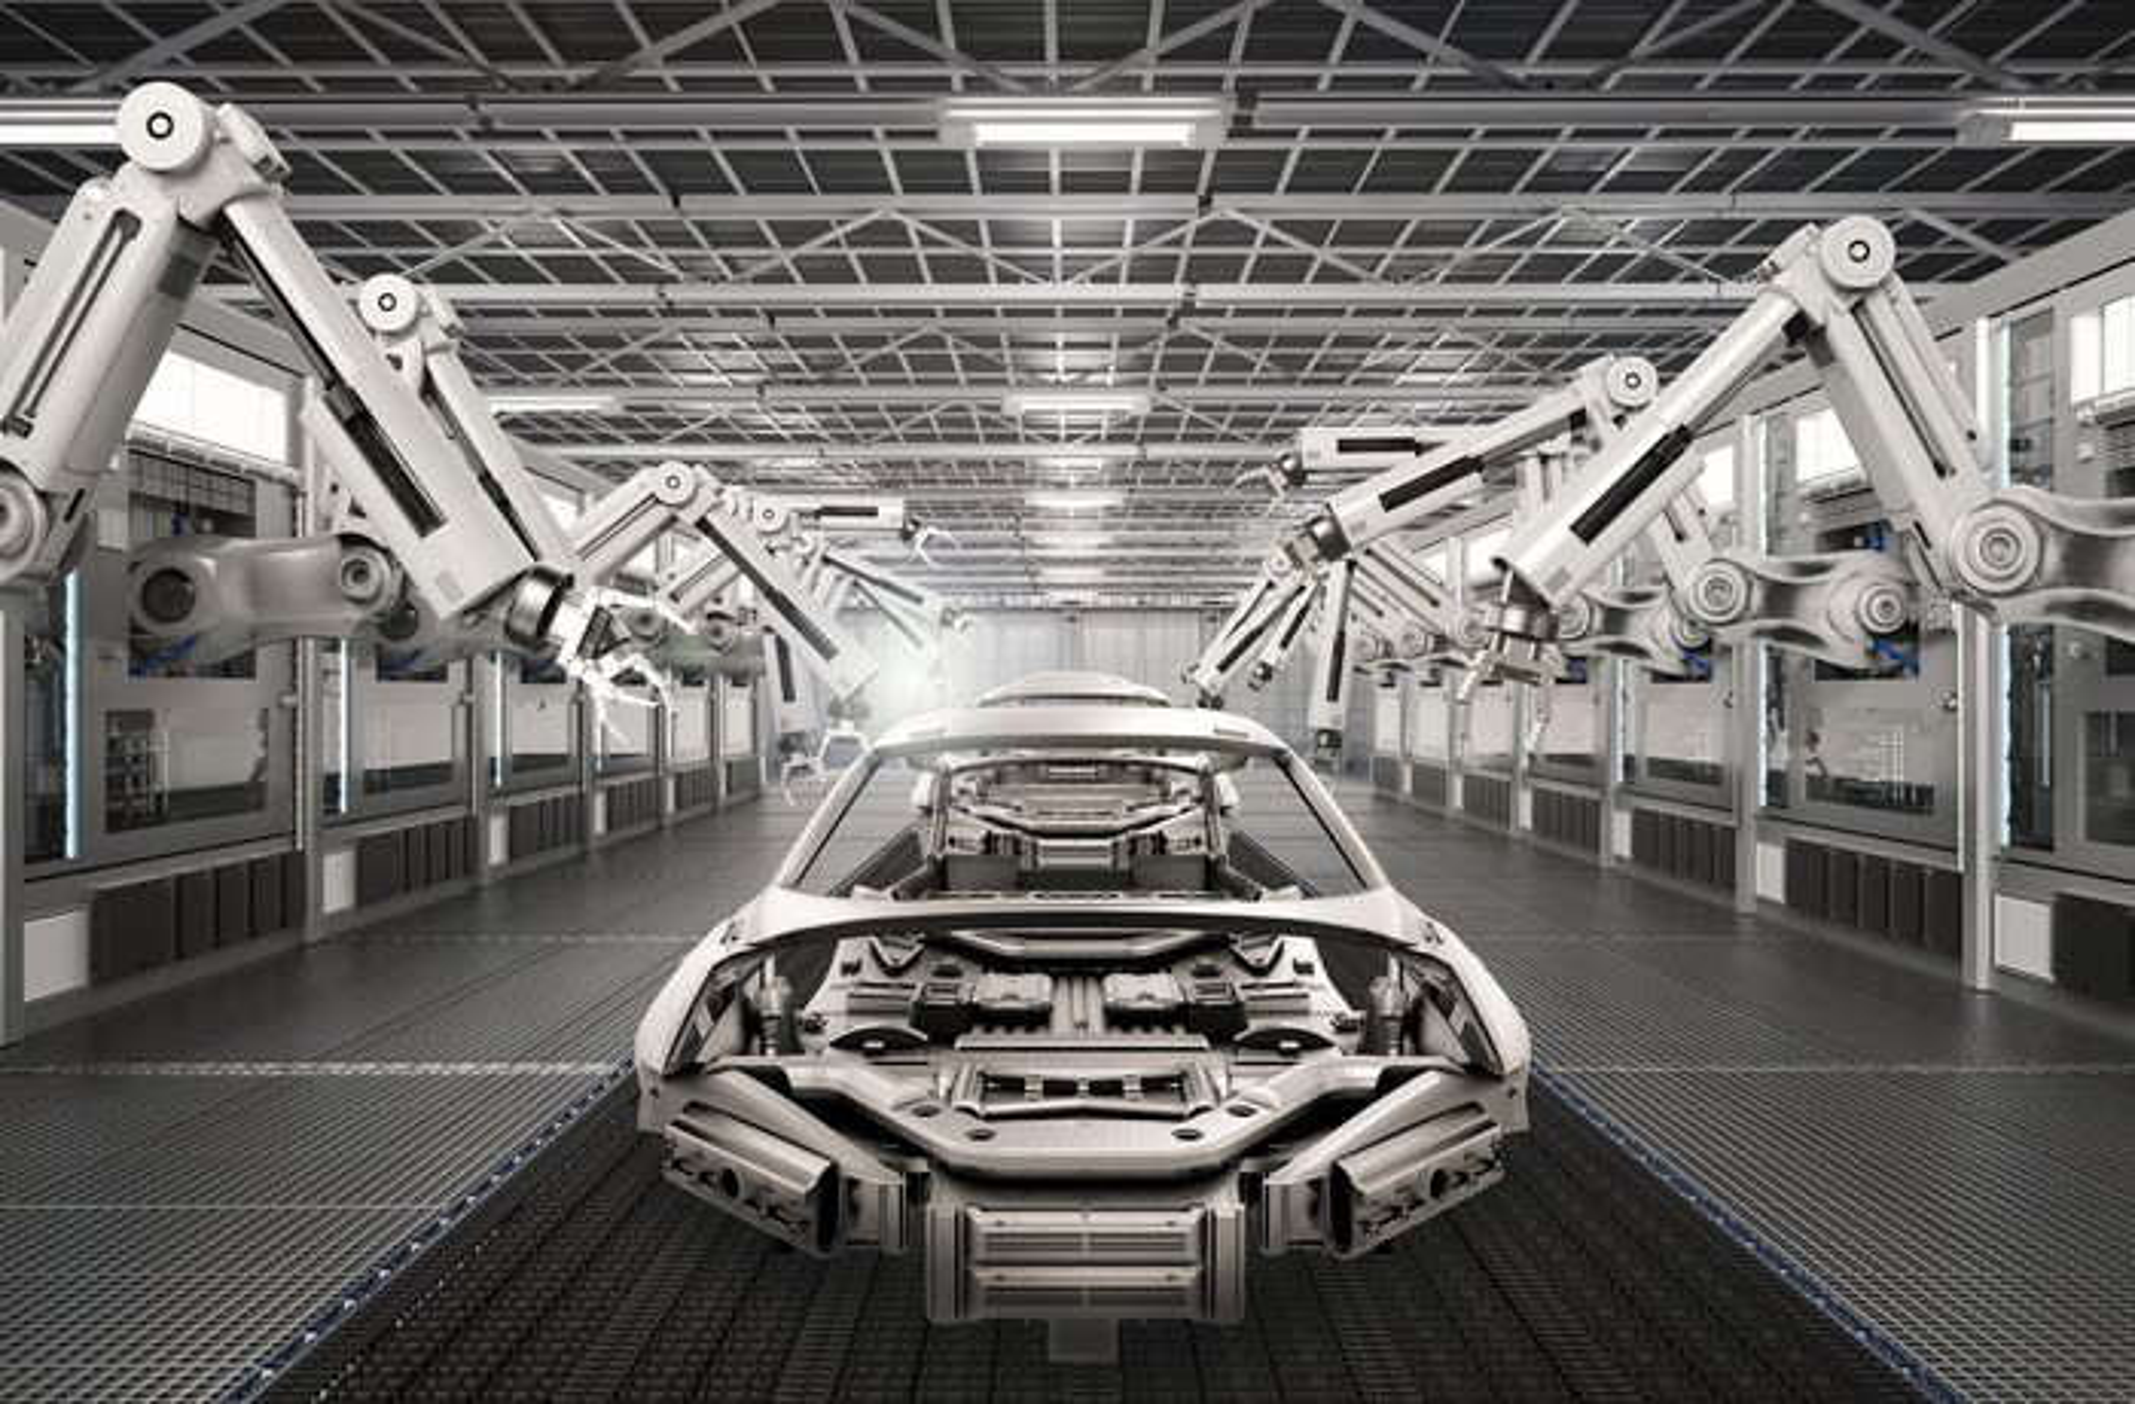 Digital representation of auto manufacturing plant.